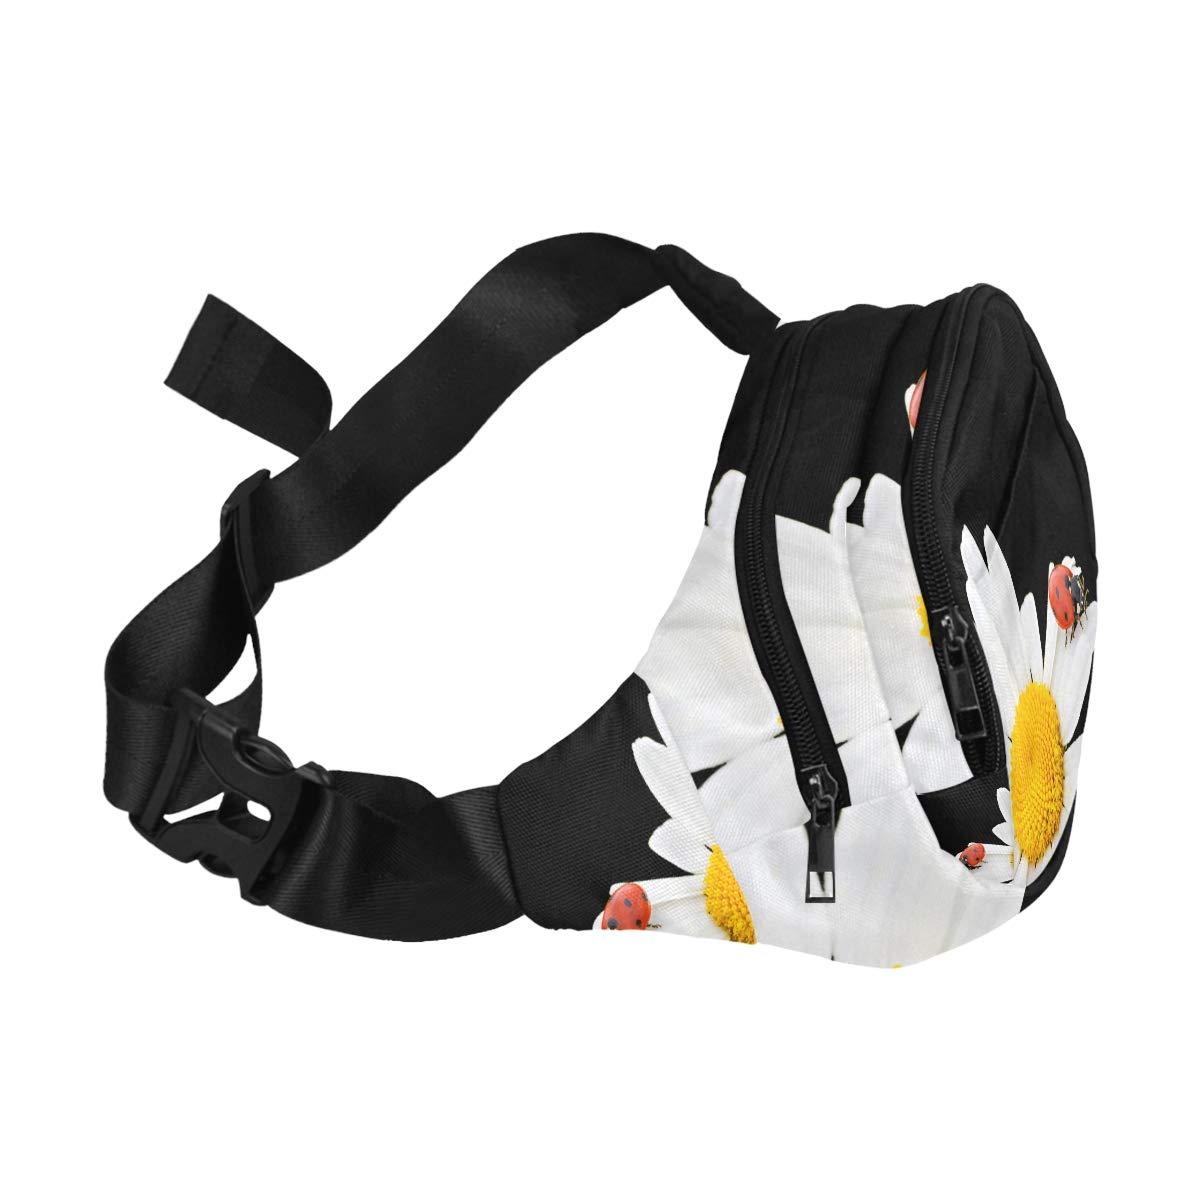 Ladybug On Spring Flowers Fenny Packs Waist Bags Adjustable Belt Waterproof Nylon Travel Running Sport Vacation Party For Men Women Boys Girls Kids